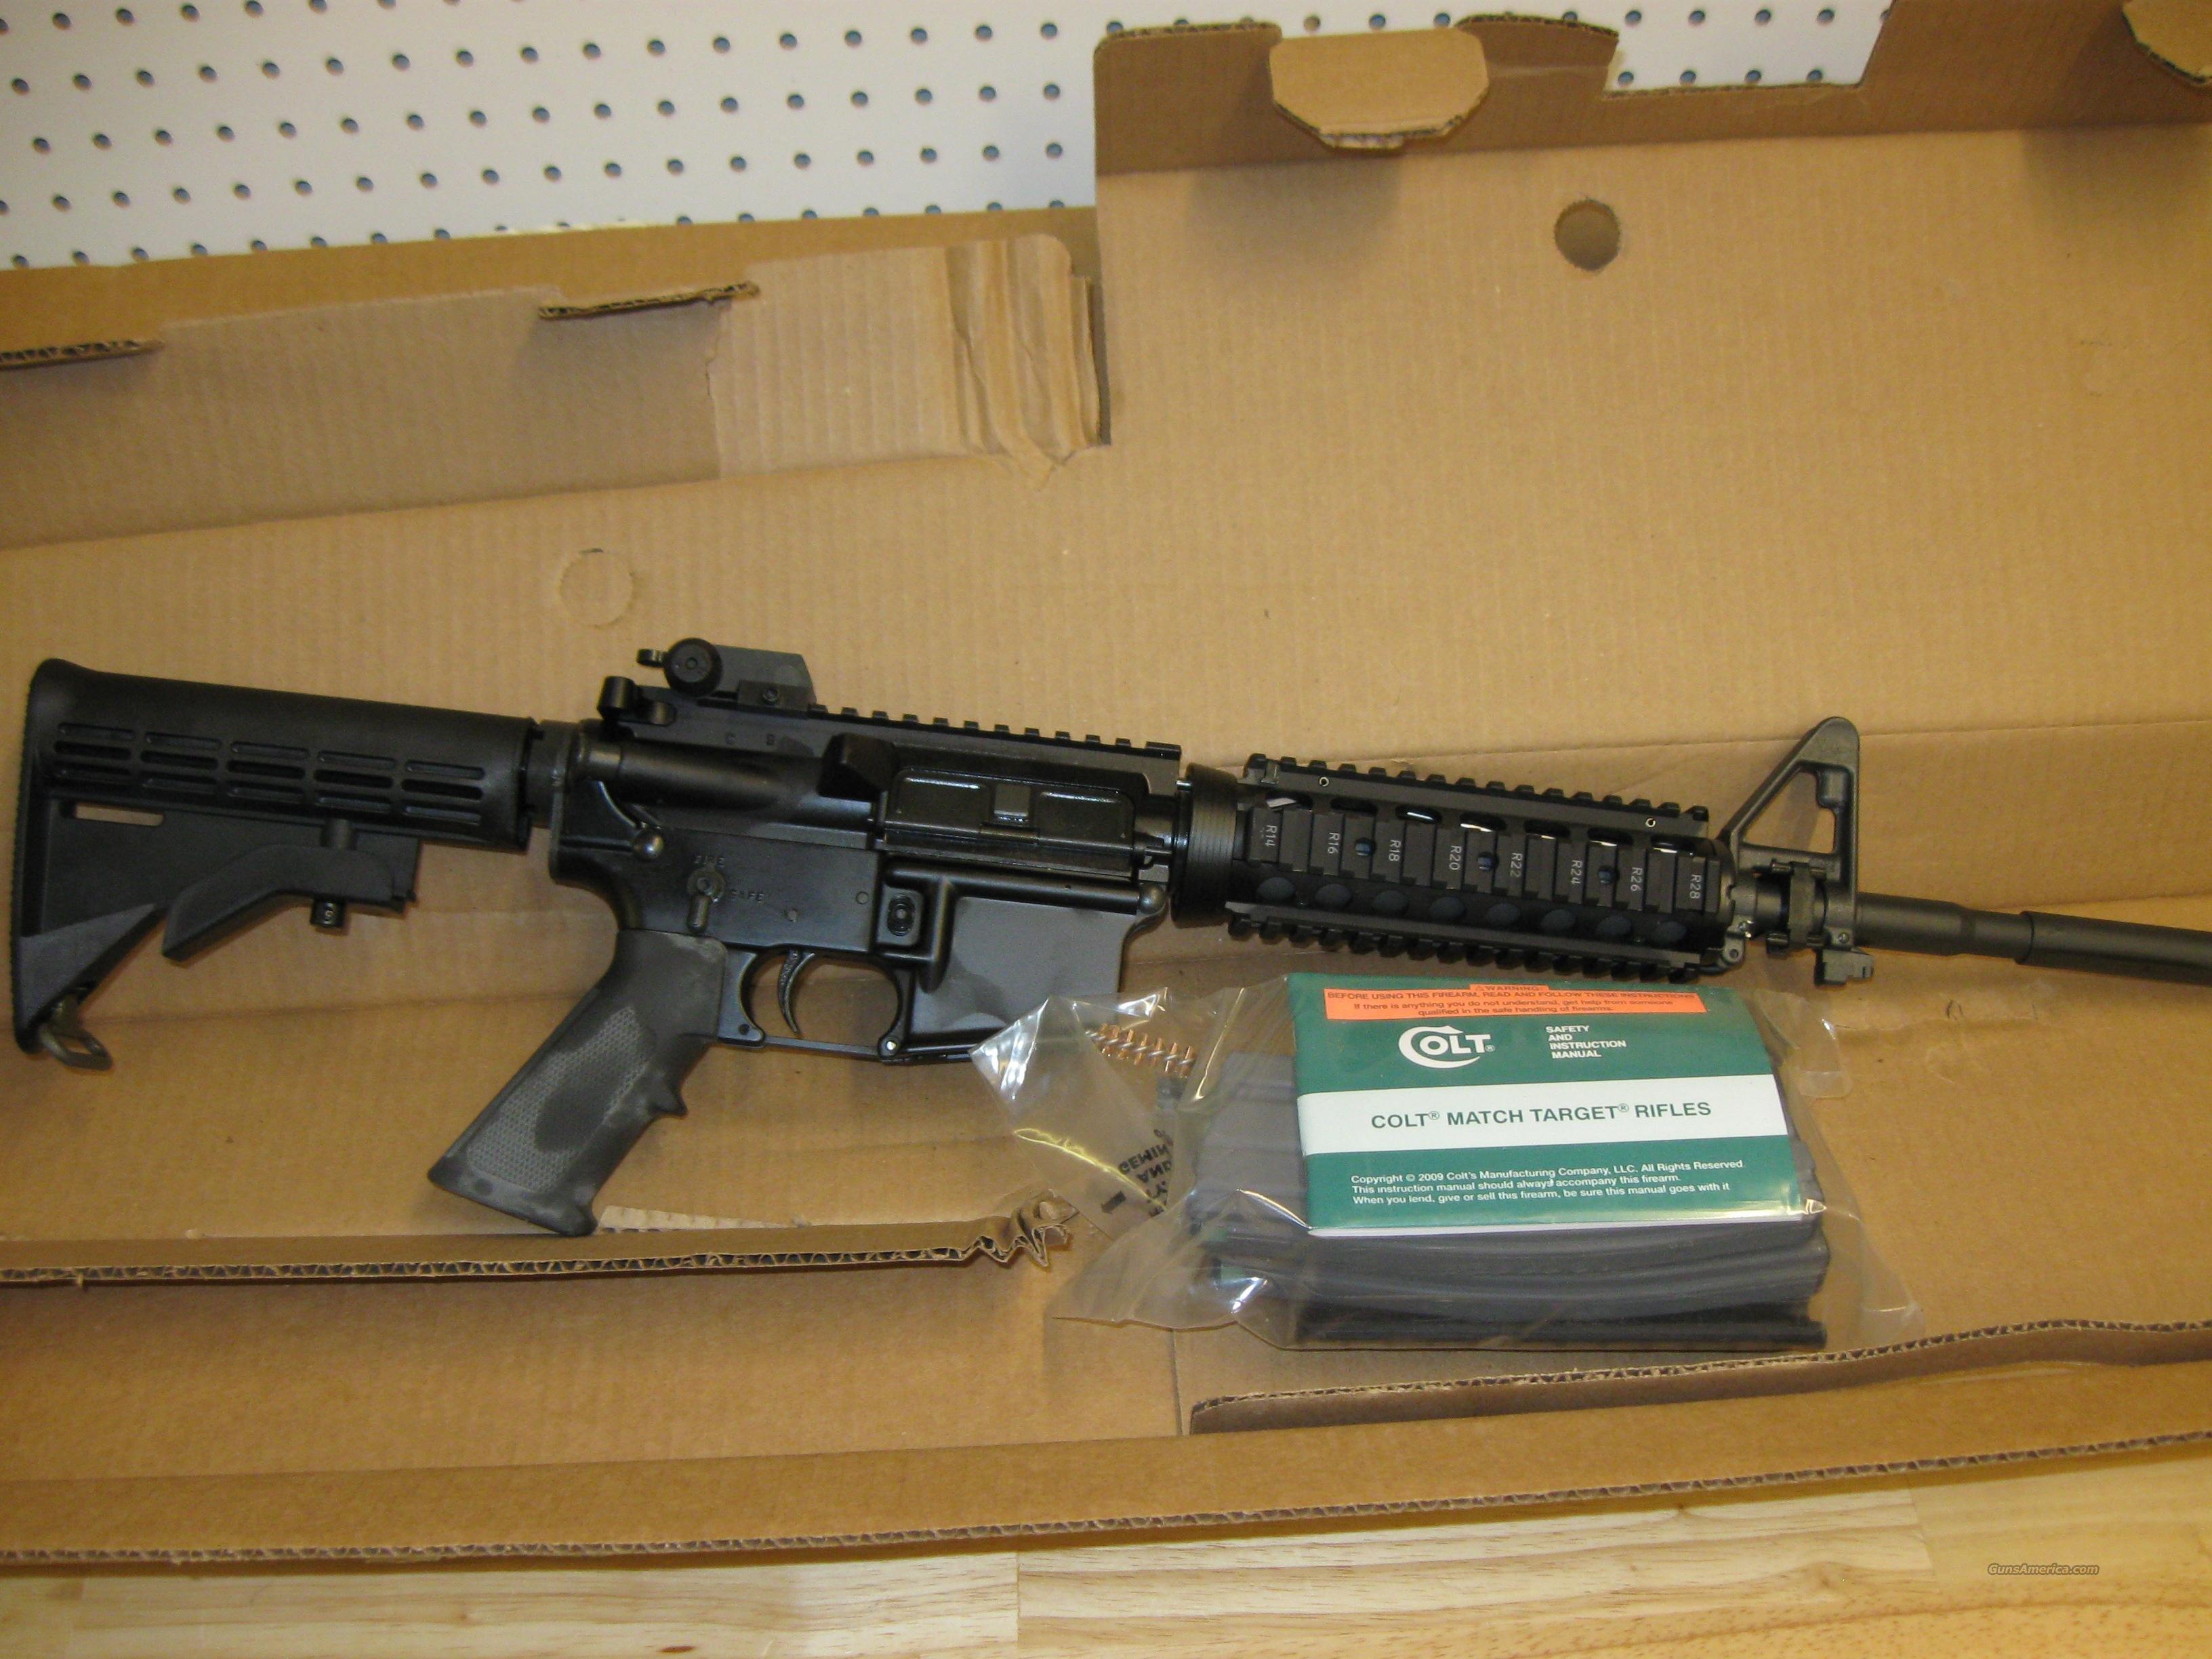 colt m4 carbine socom le6920 5 56mm 16 buis kn for sale rh gunsamerica com colt m4 carbine manual walther colt m4 manual